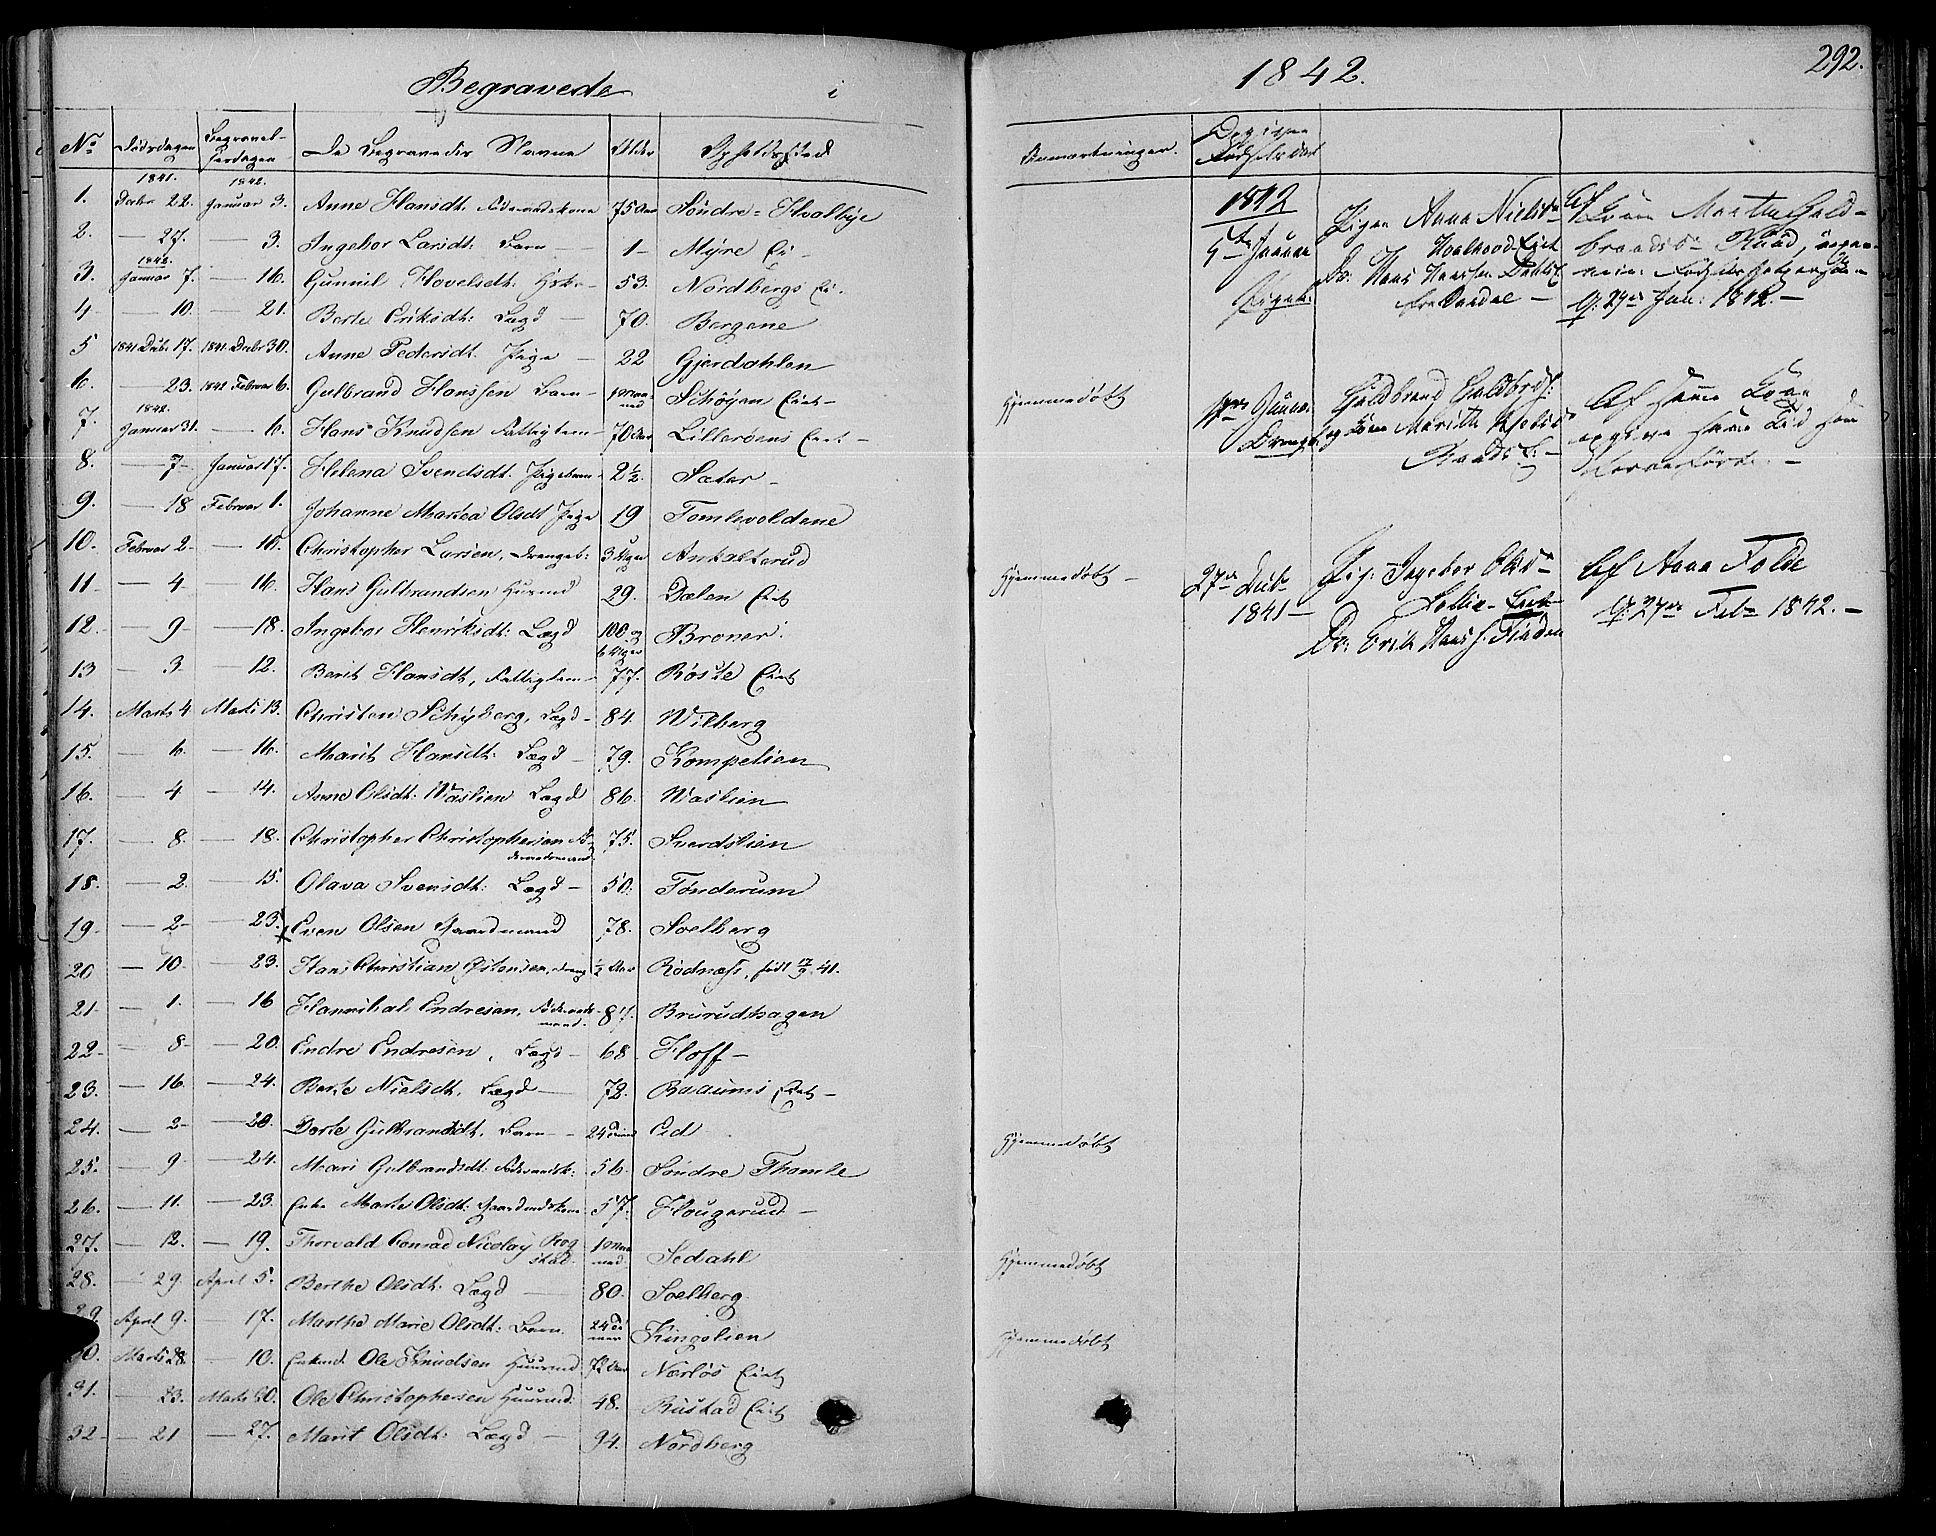 SAH, Land prestekontor, Ministerialbok nr. 8, 1830-1846, s. 292